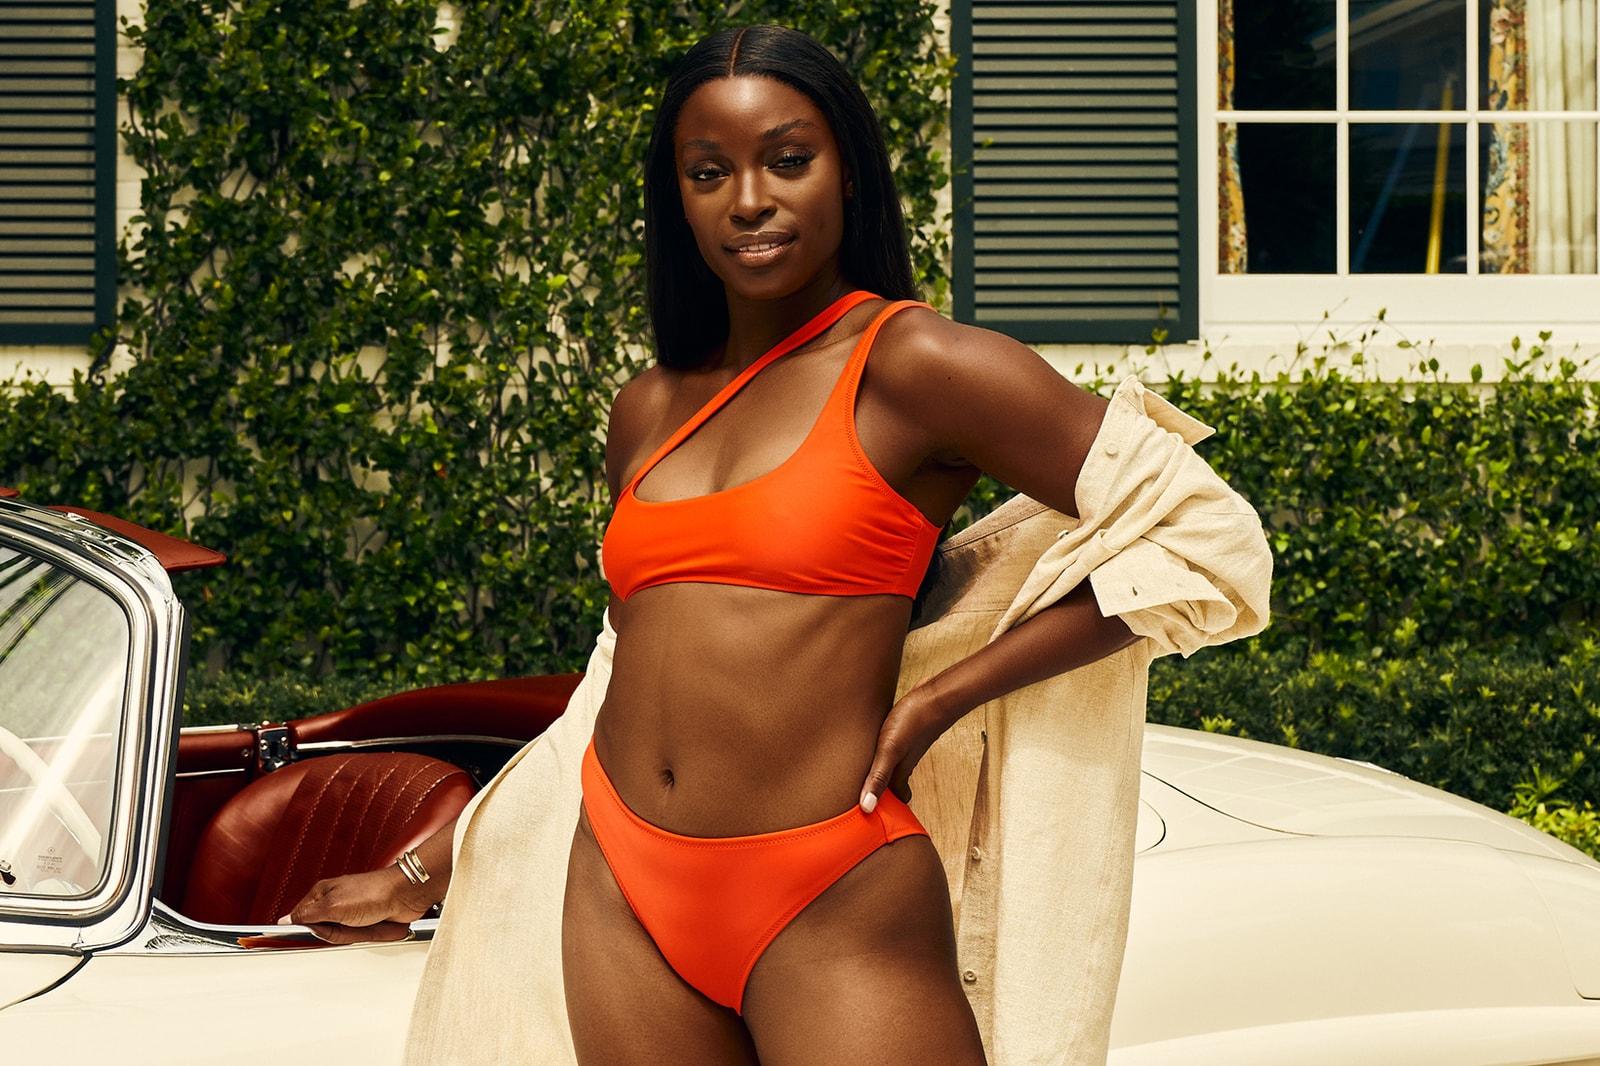 frankies bikinis hailee steinfeld ookioh bikinis shorts beachwear swimwear swimsuits